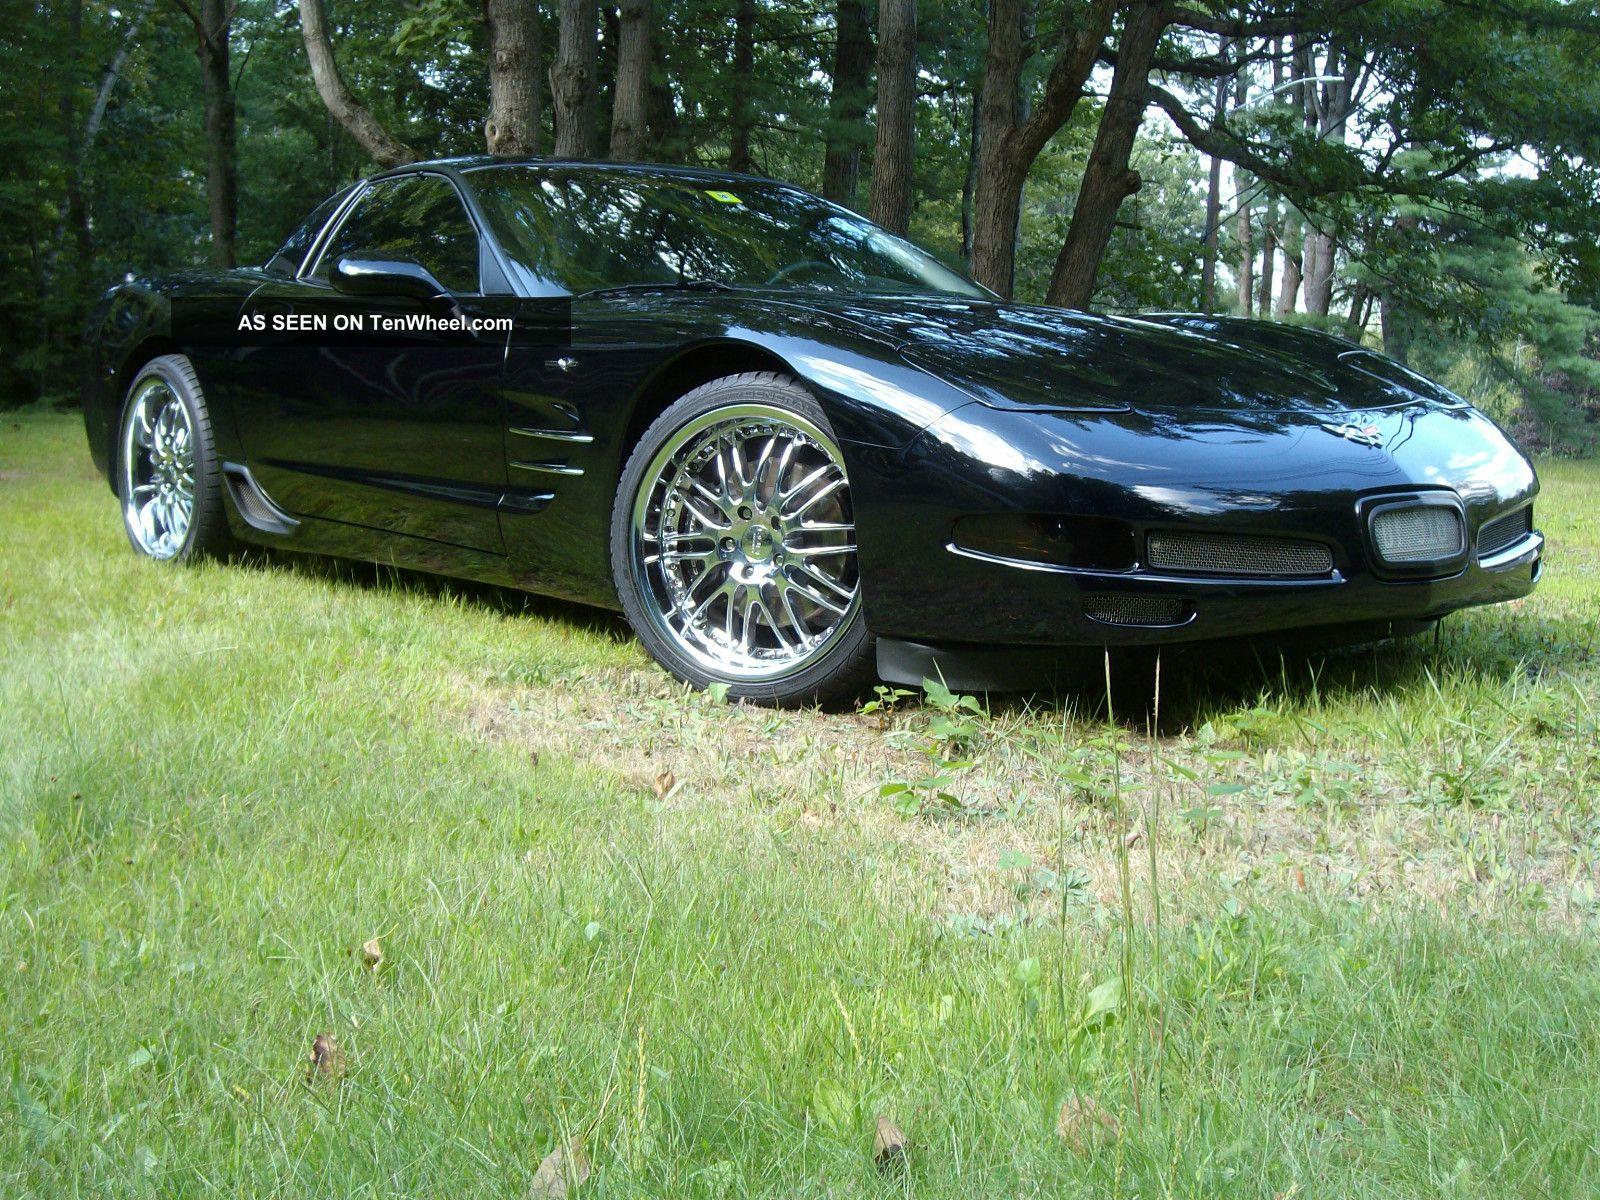 1999 Frc Chevrolet Corvette Corvette photo